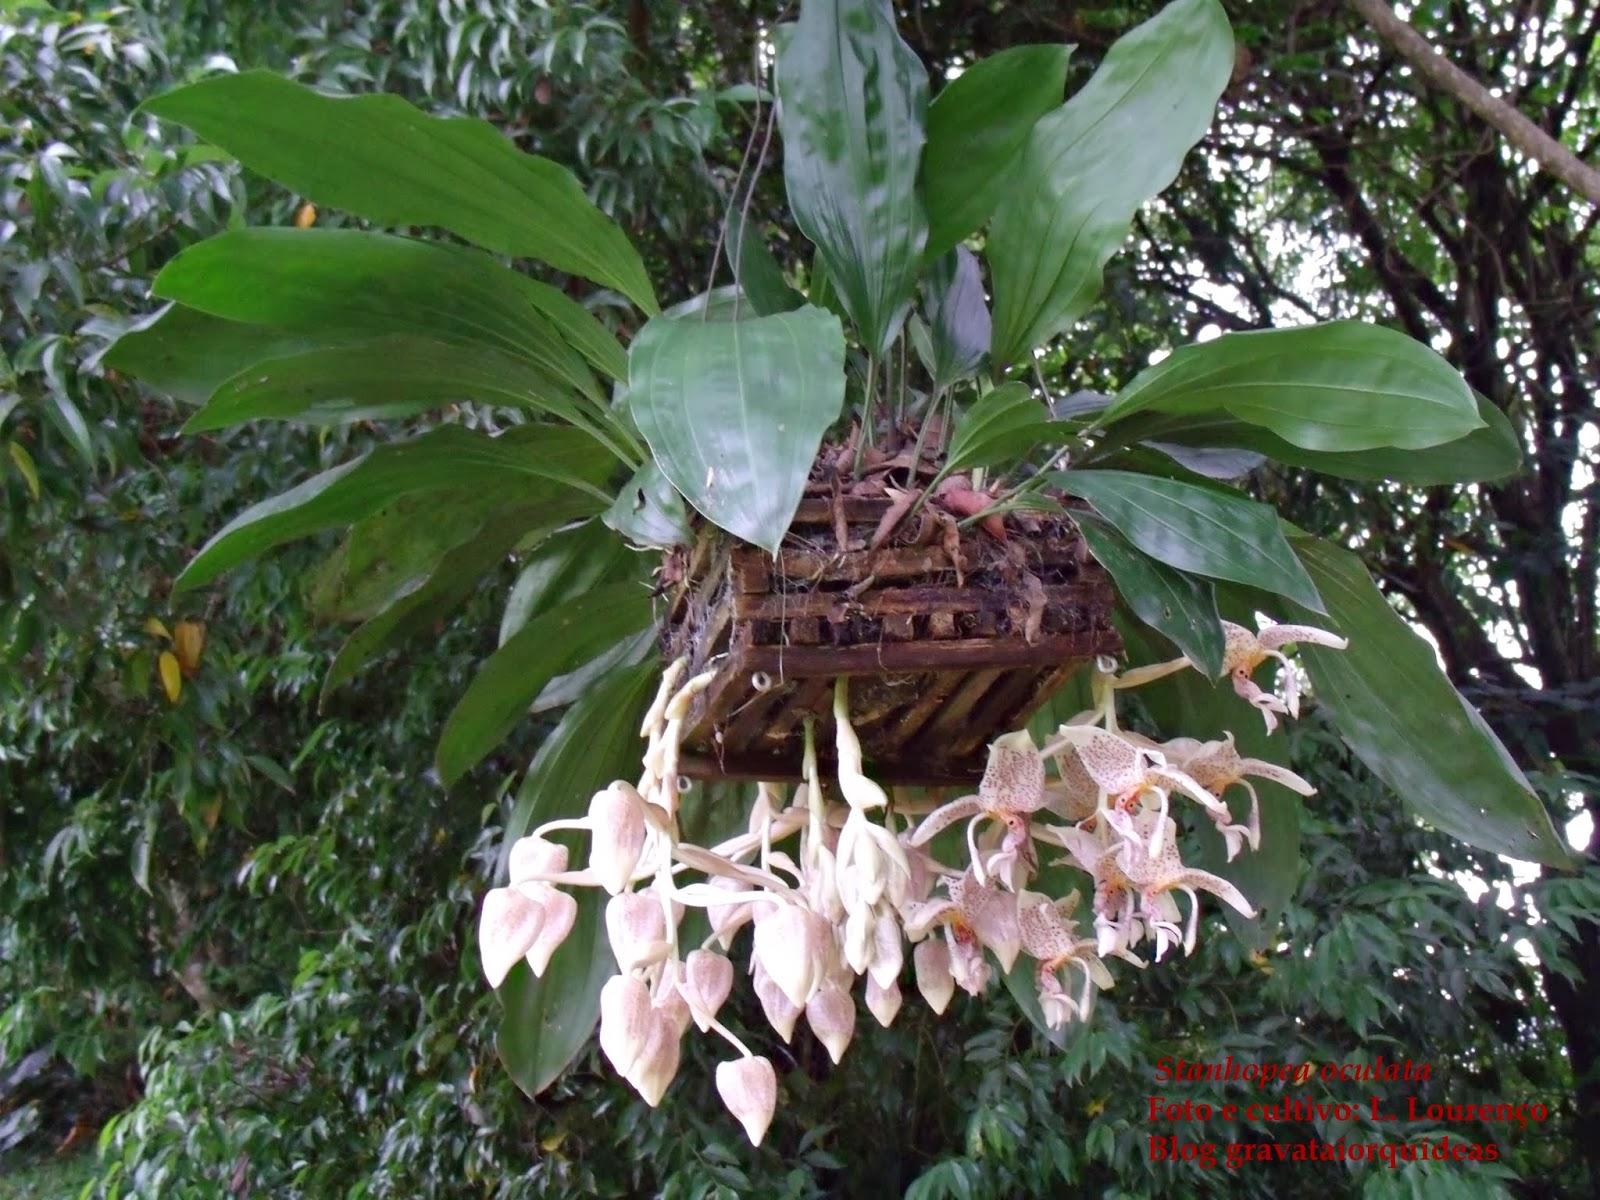 Stanhopea oculata